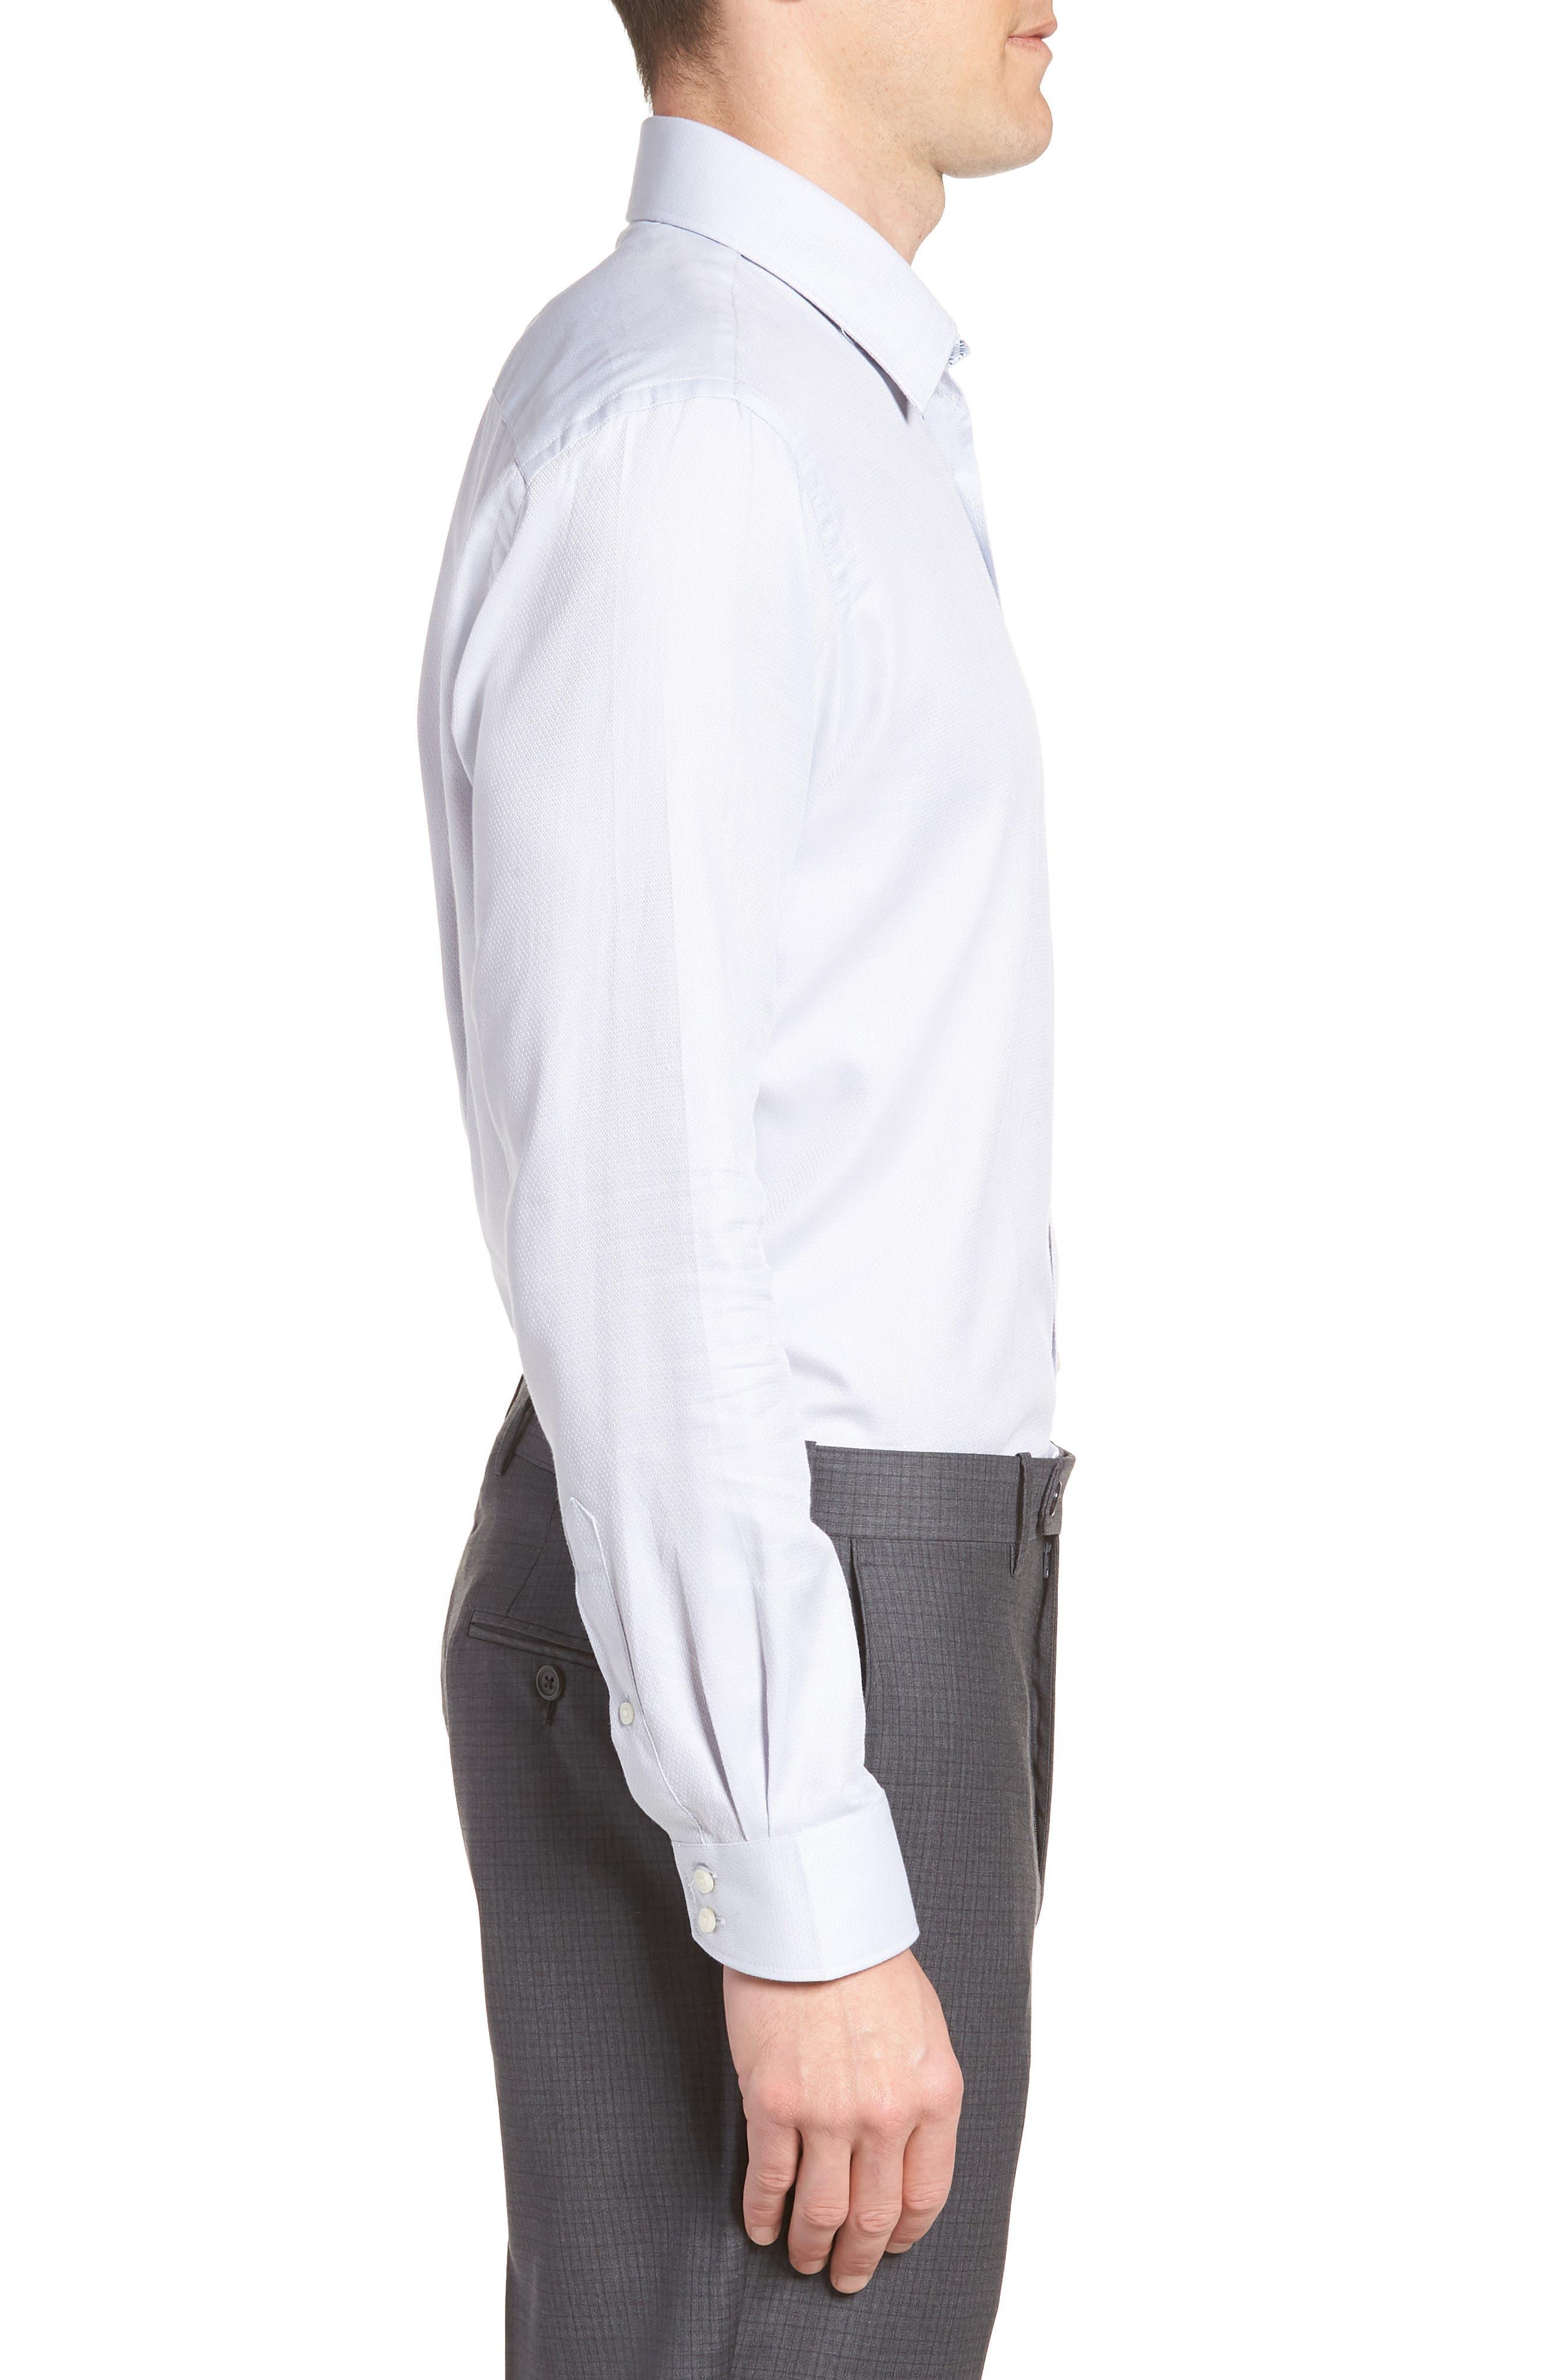 Ollyox Slim Fit Solid Dress Shirt,                             Alternate thumbnail 4, color,                             GREY